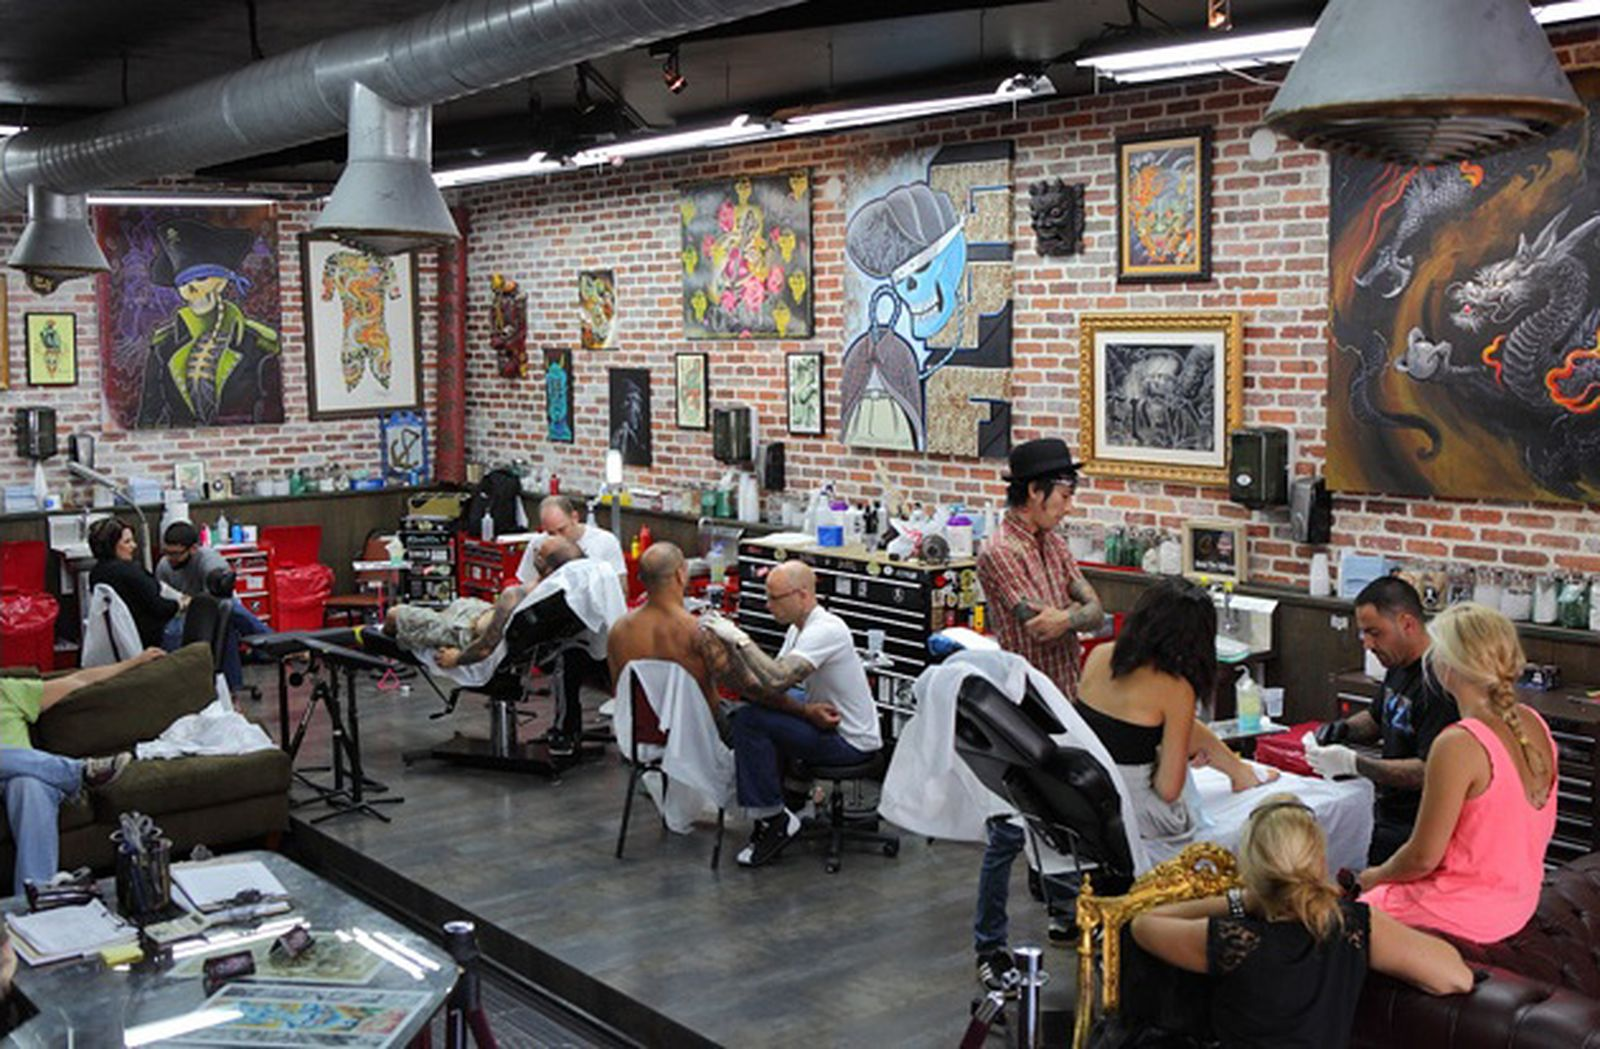 10-best-tattoo-parlors-united-states-01